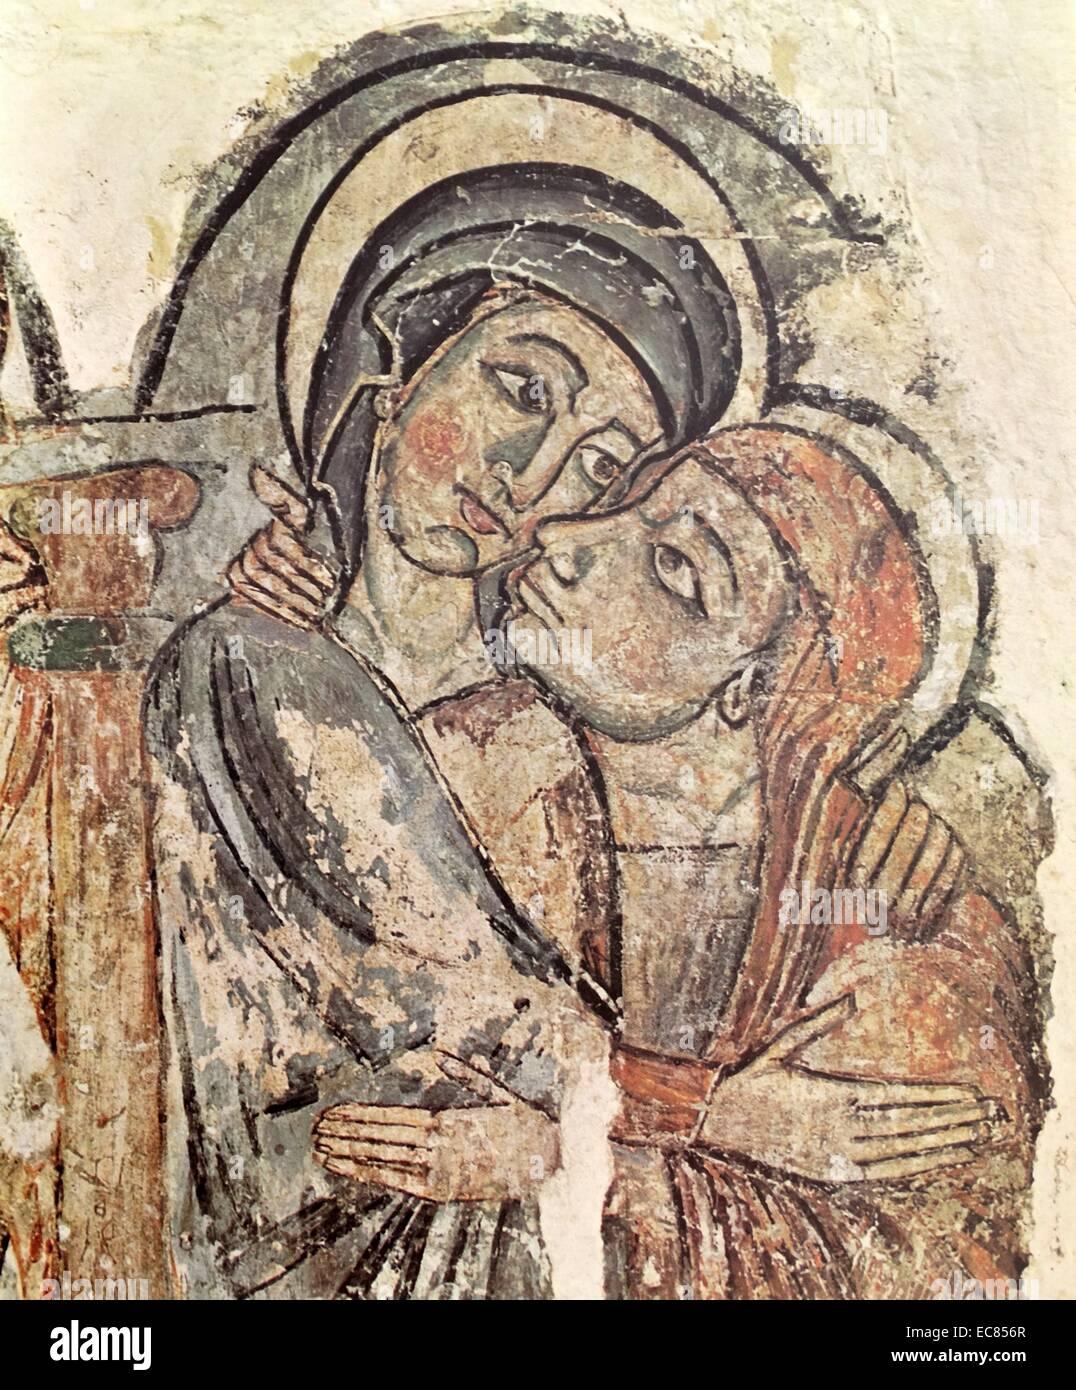 Fragment der Heimsuchung Catalonia. Vom 13. Jahrhundert. Stockbild